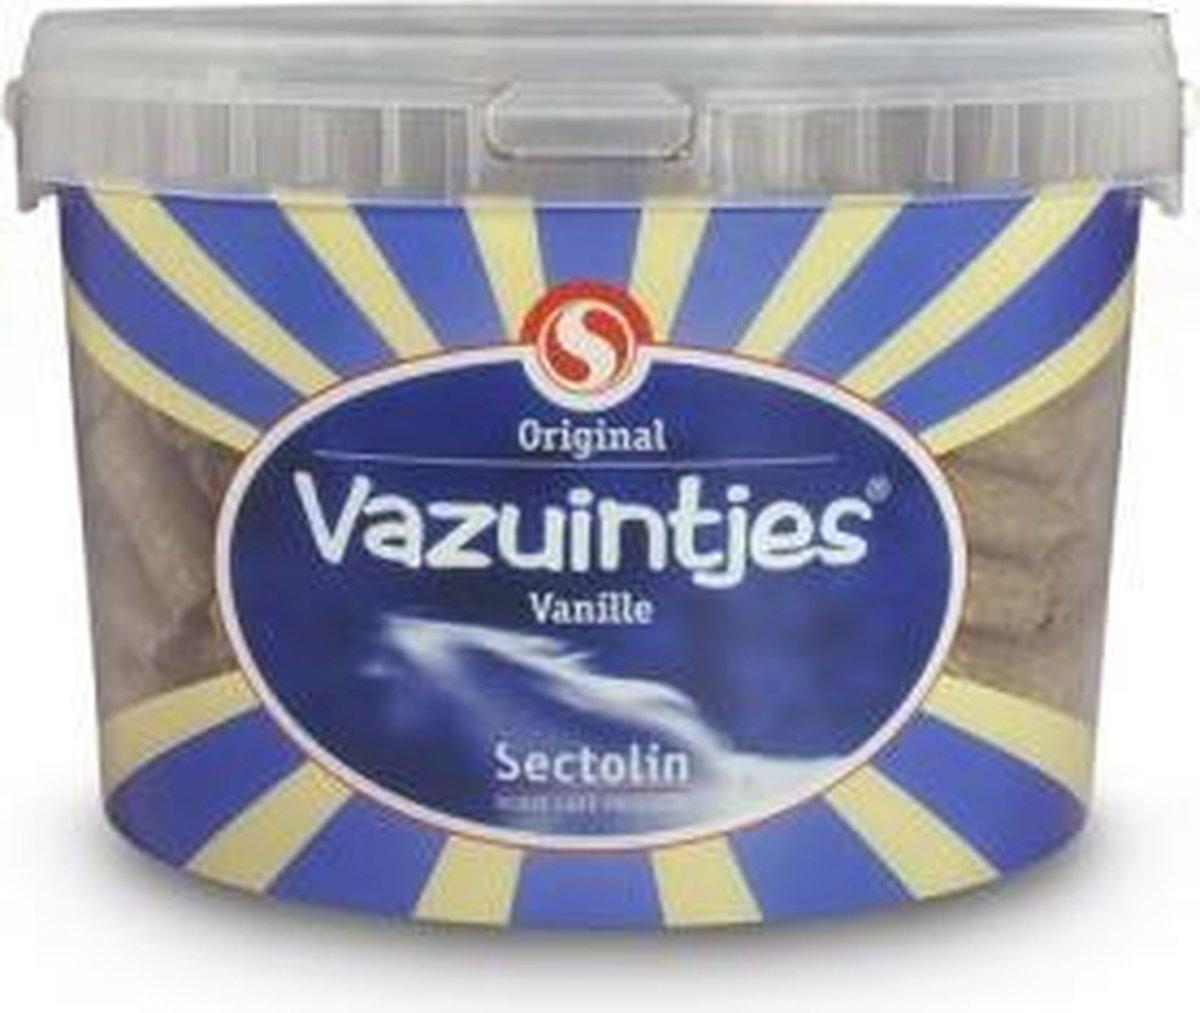 Sectolin Vazuintjes Paardensnoepjes - 2 kg - Sectolin